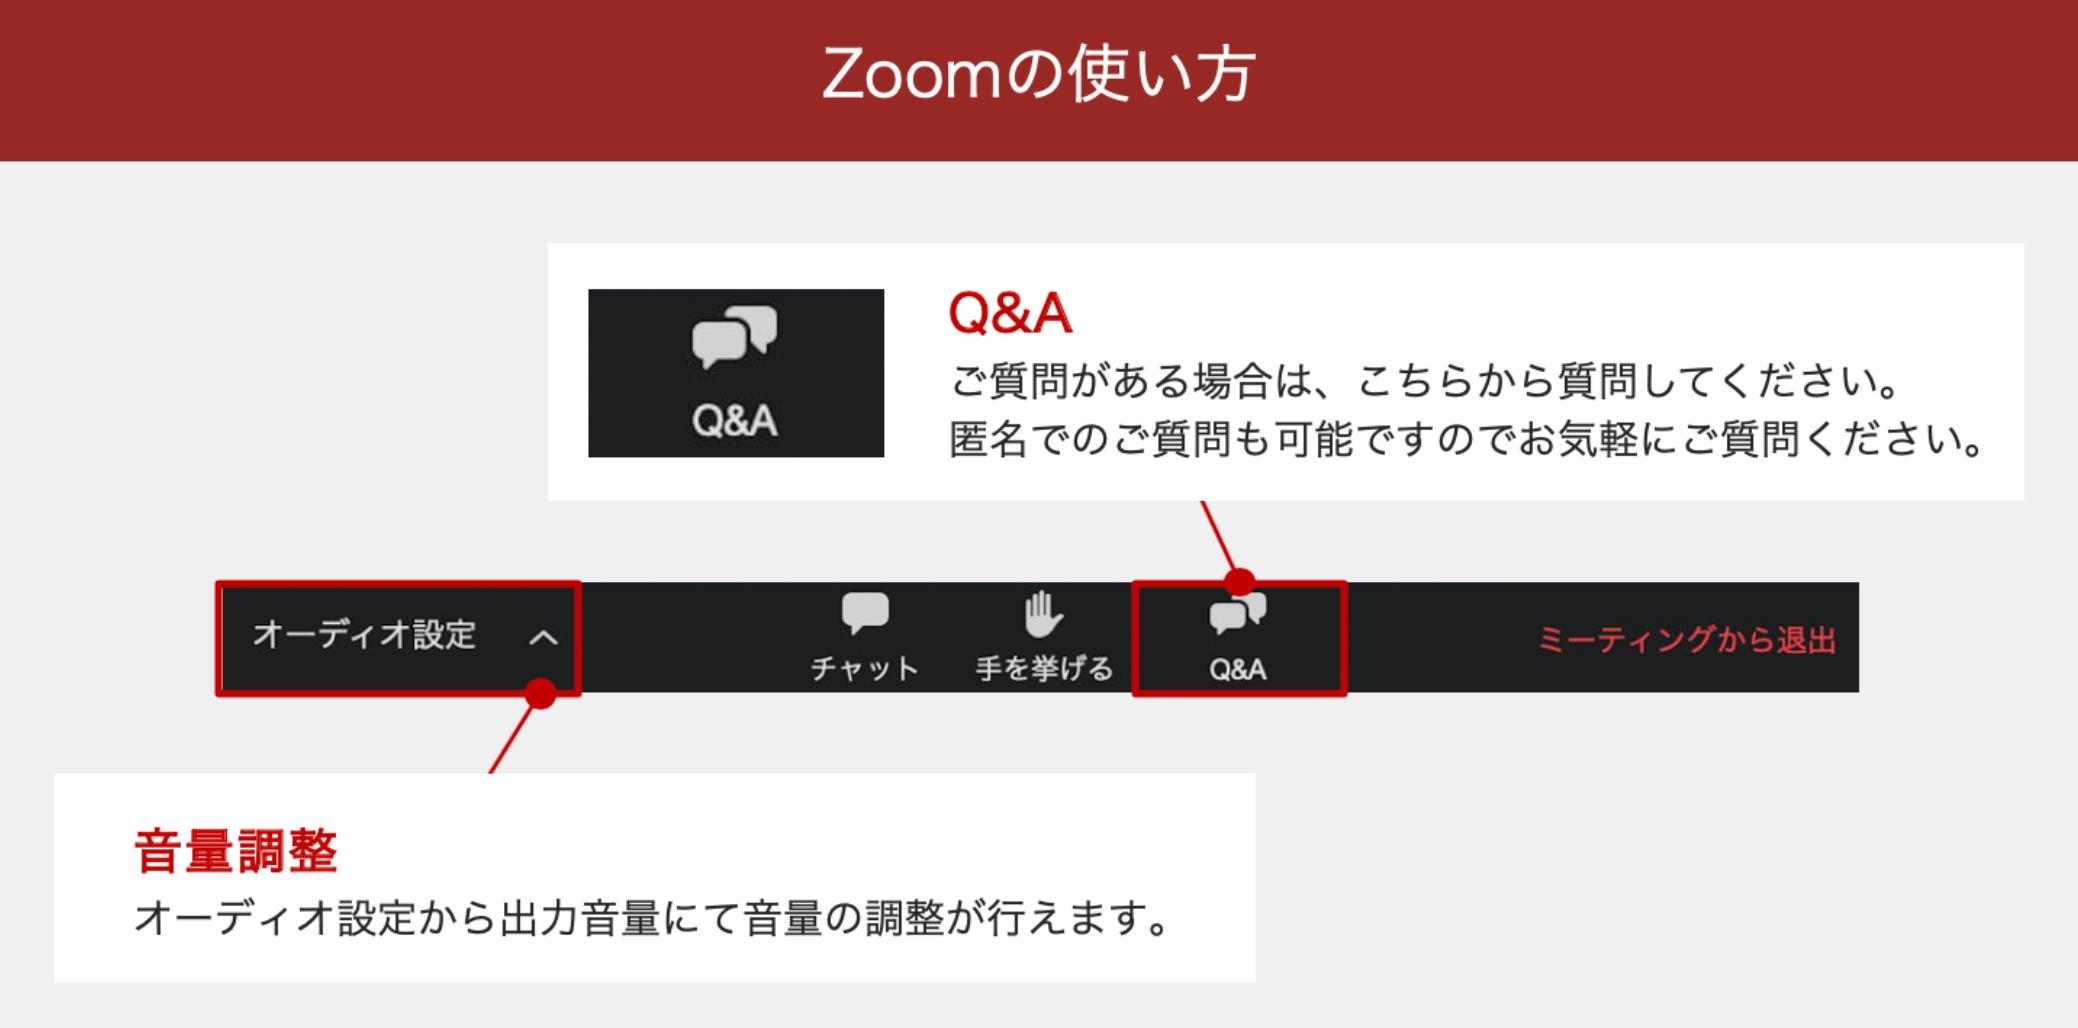 Zoomウェビナー参加へのパーフェクトガイド